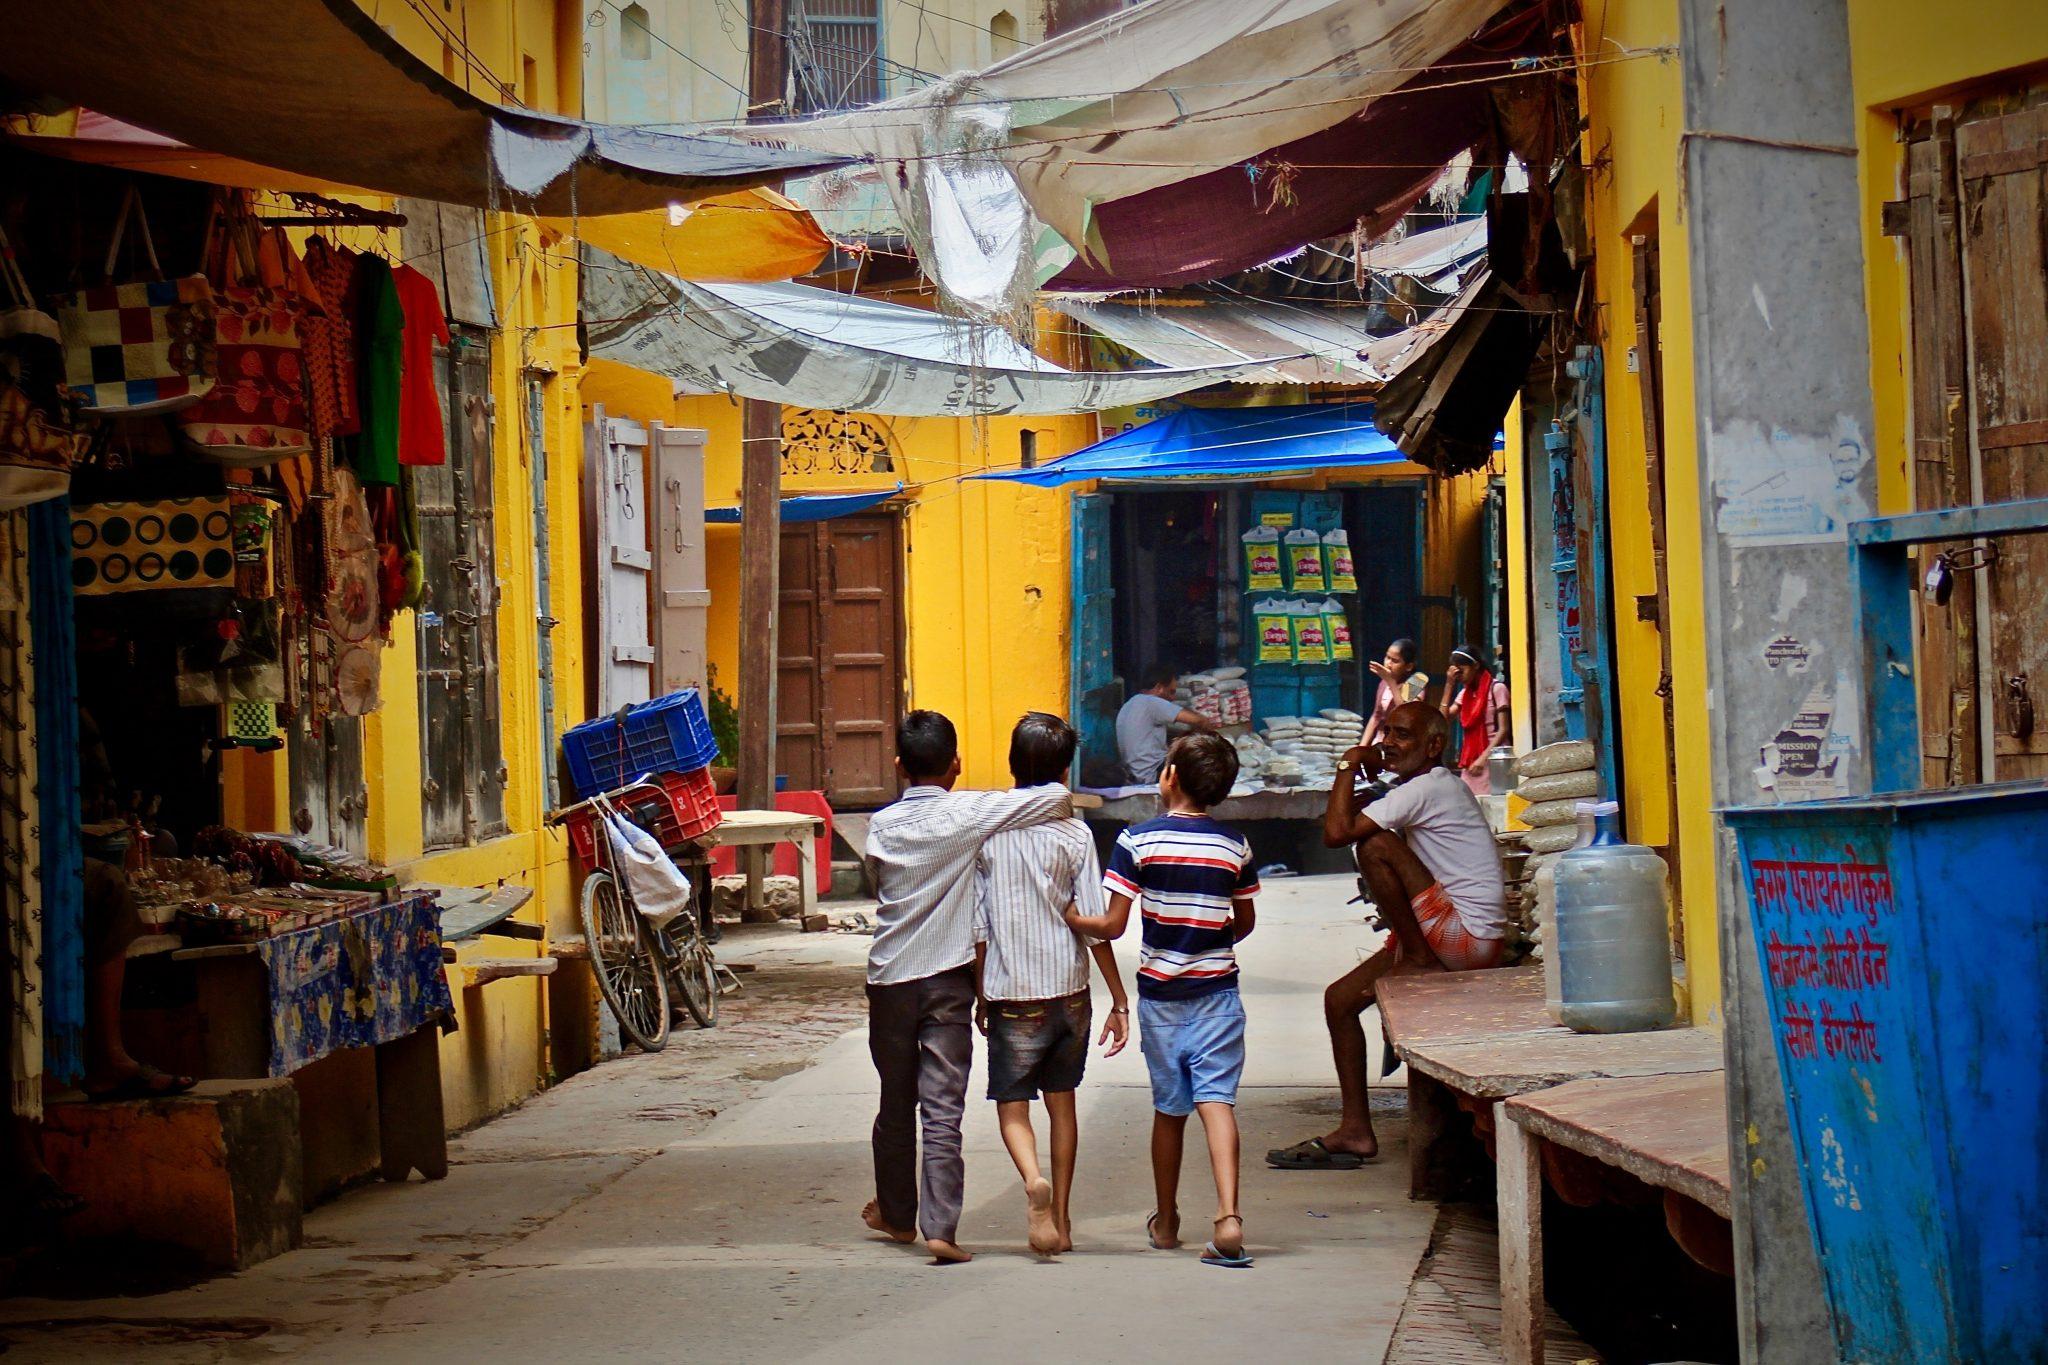 Three boys walking in the street